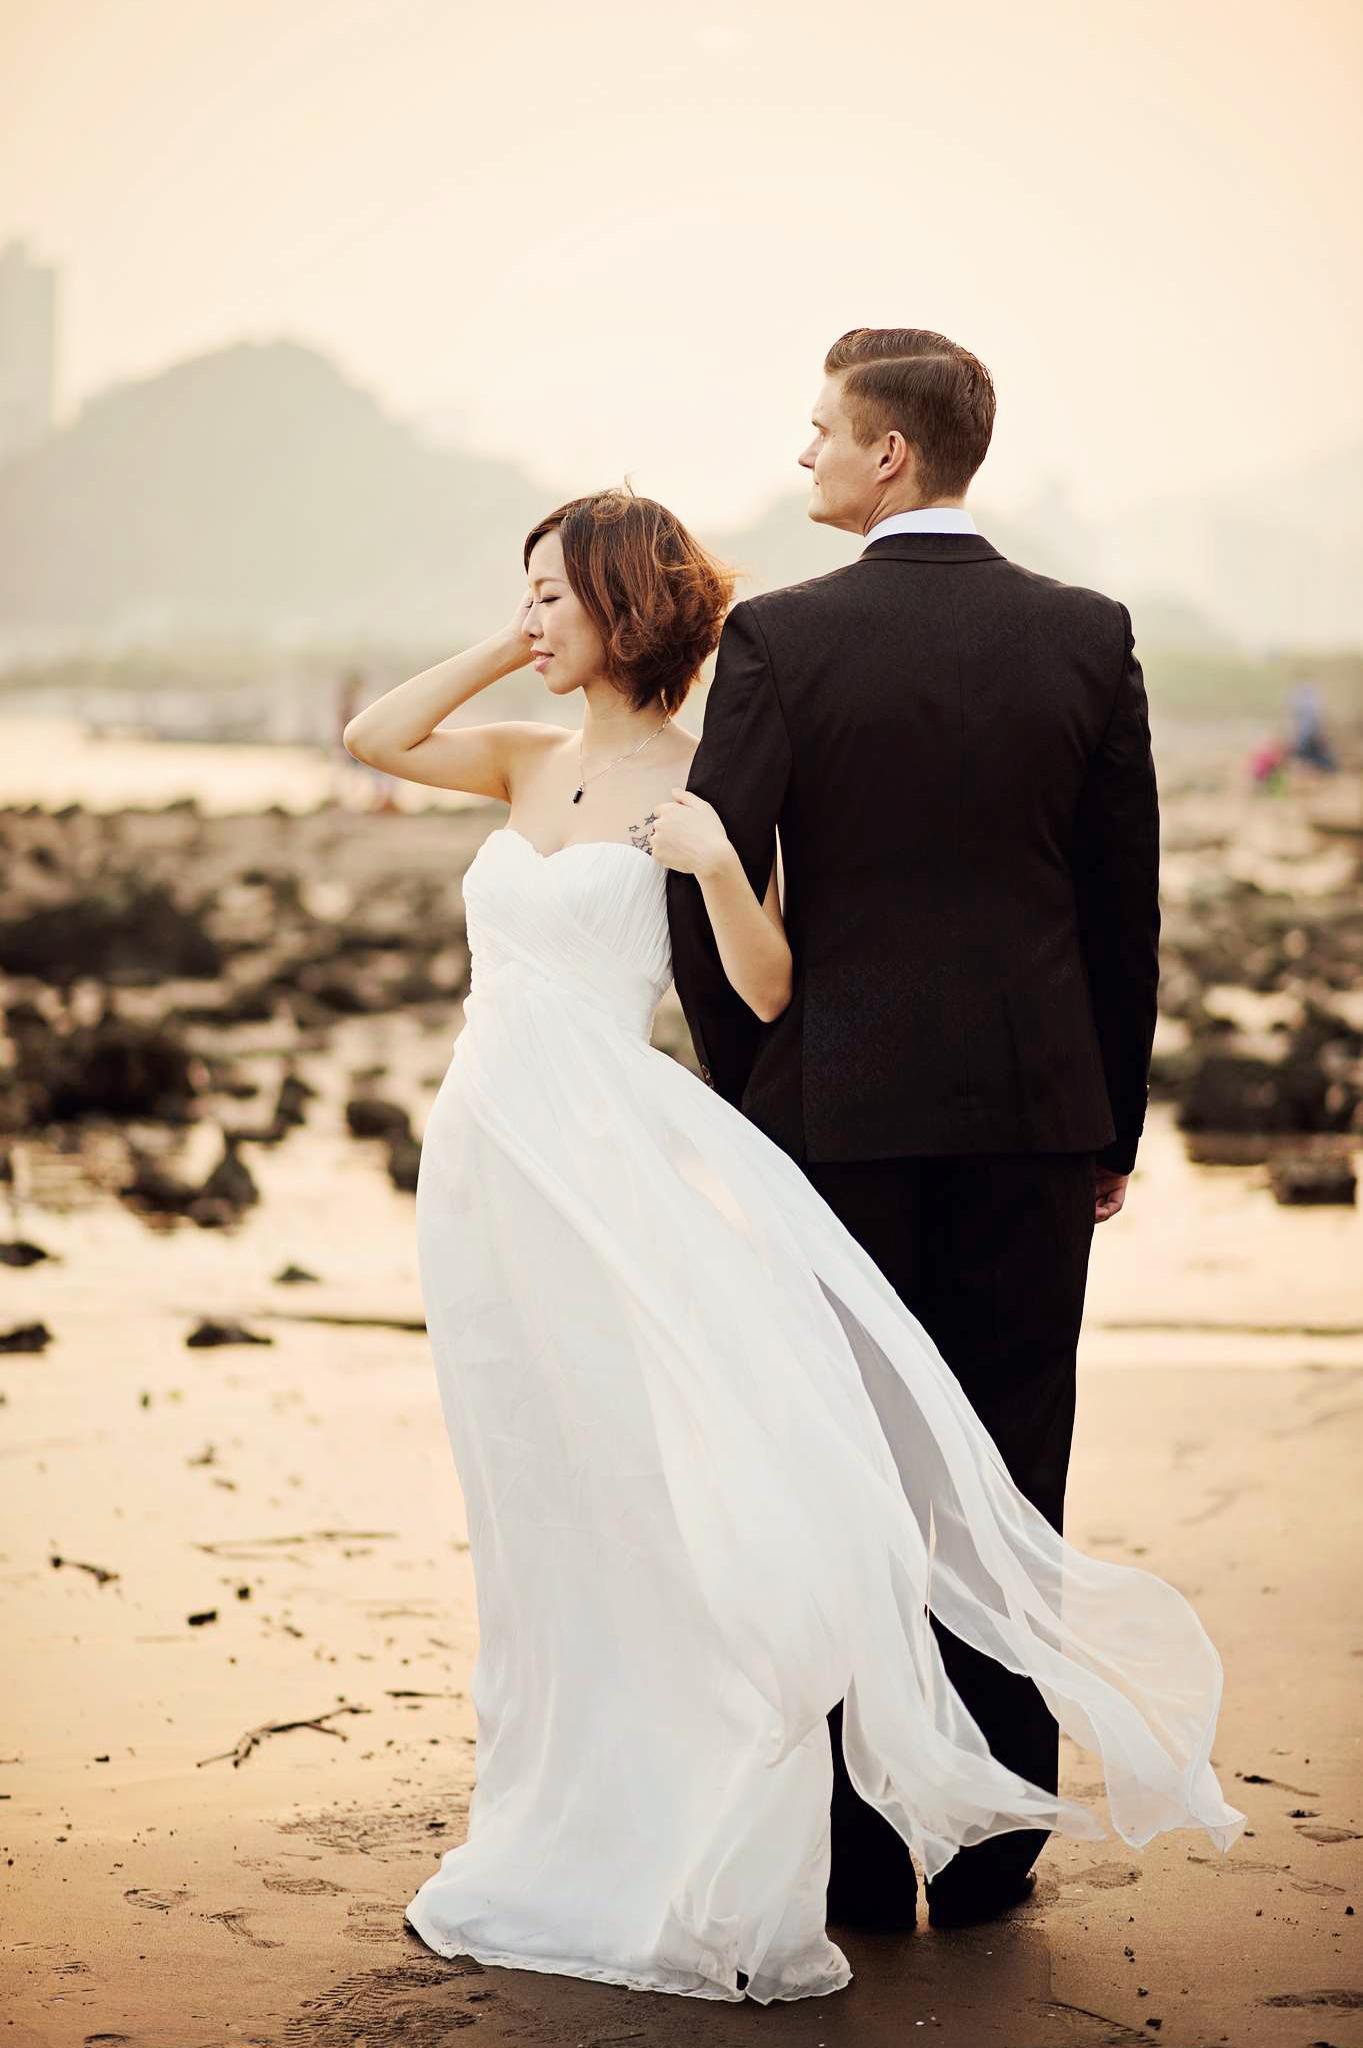 Chris_Hui_ShenZhen_Prewedding_Photography222.jpg